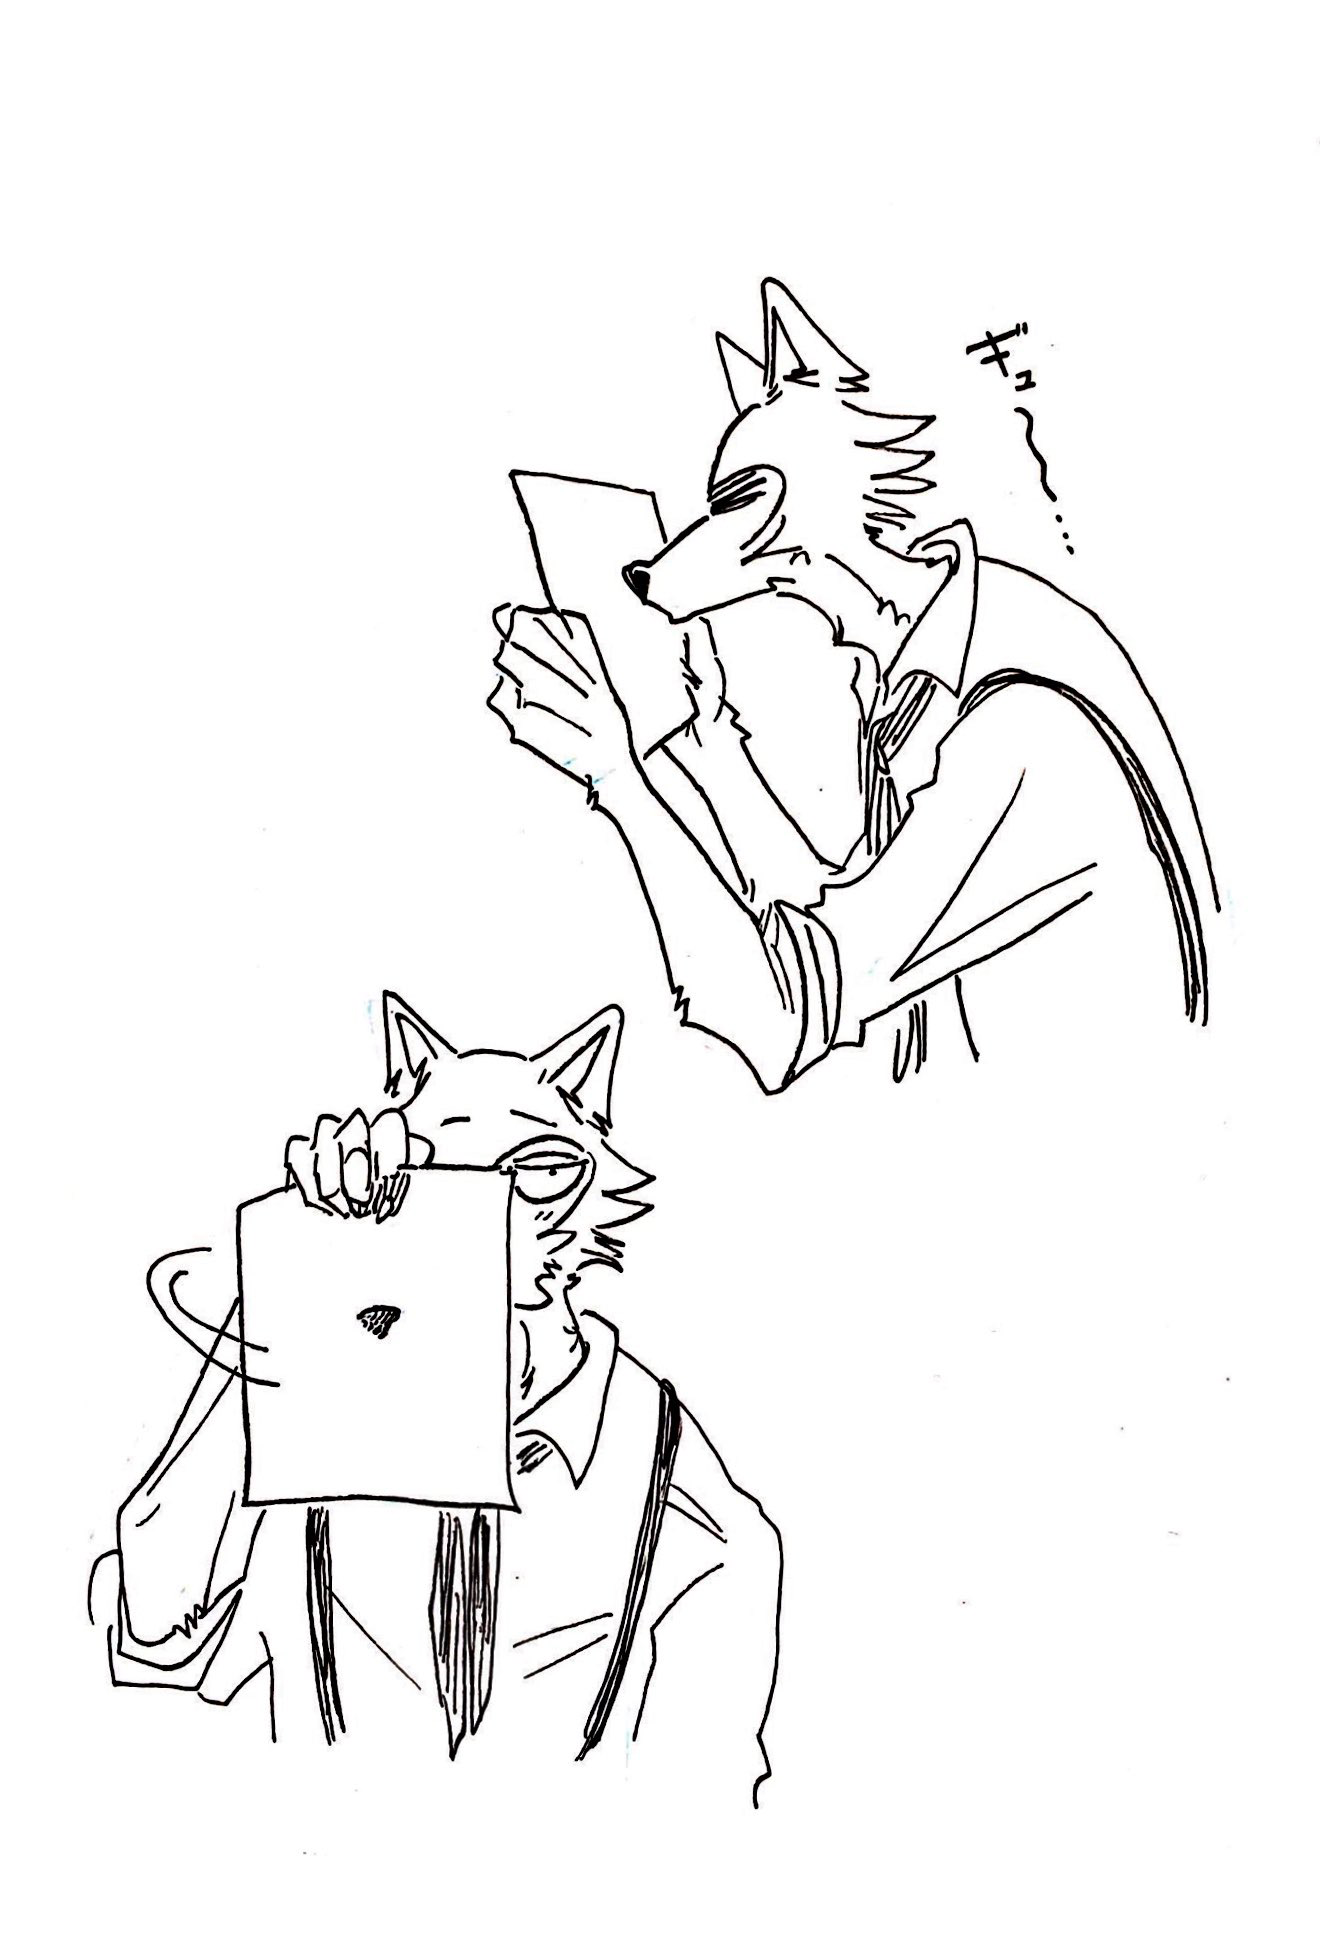 BEASTARS Anime kiss, Quirky illustration, Anime romance